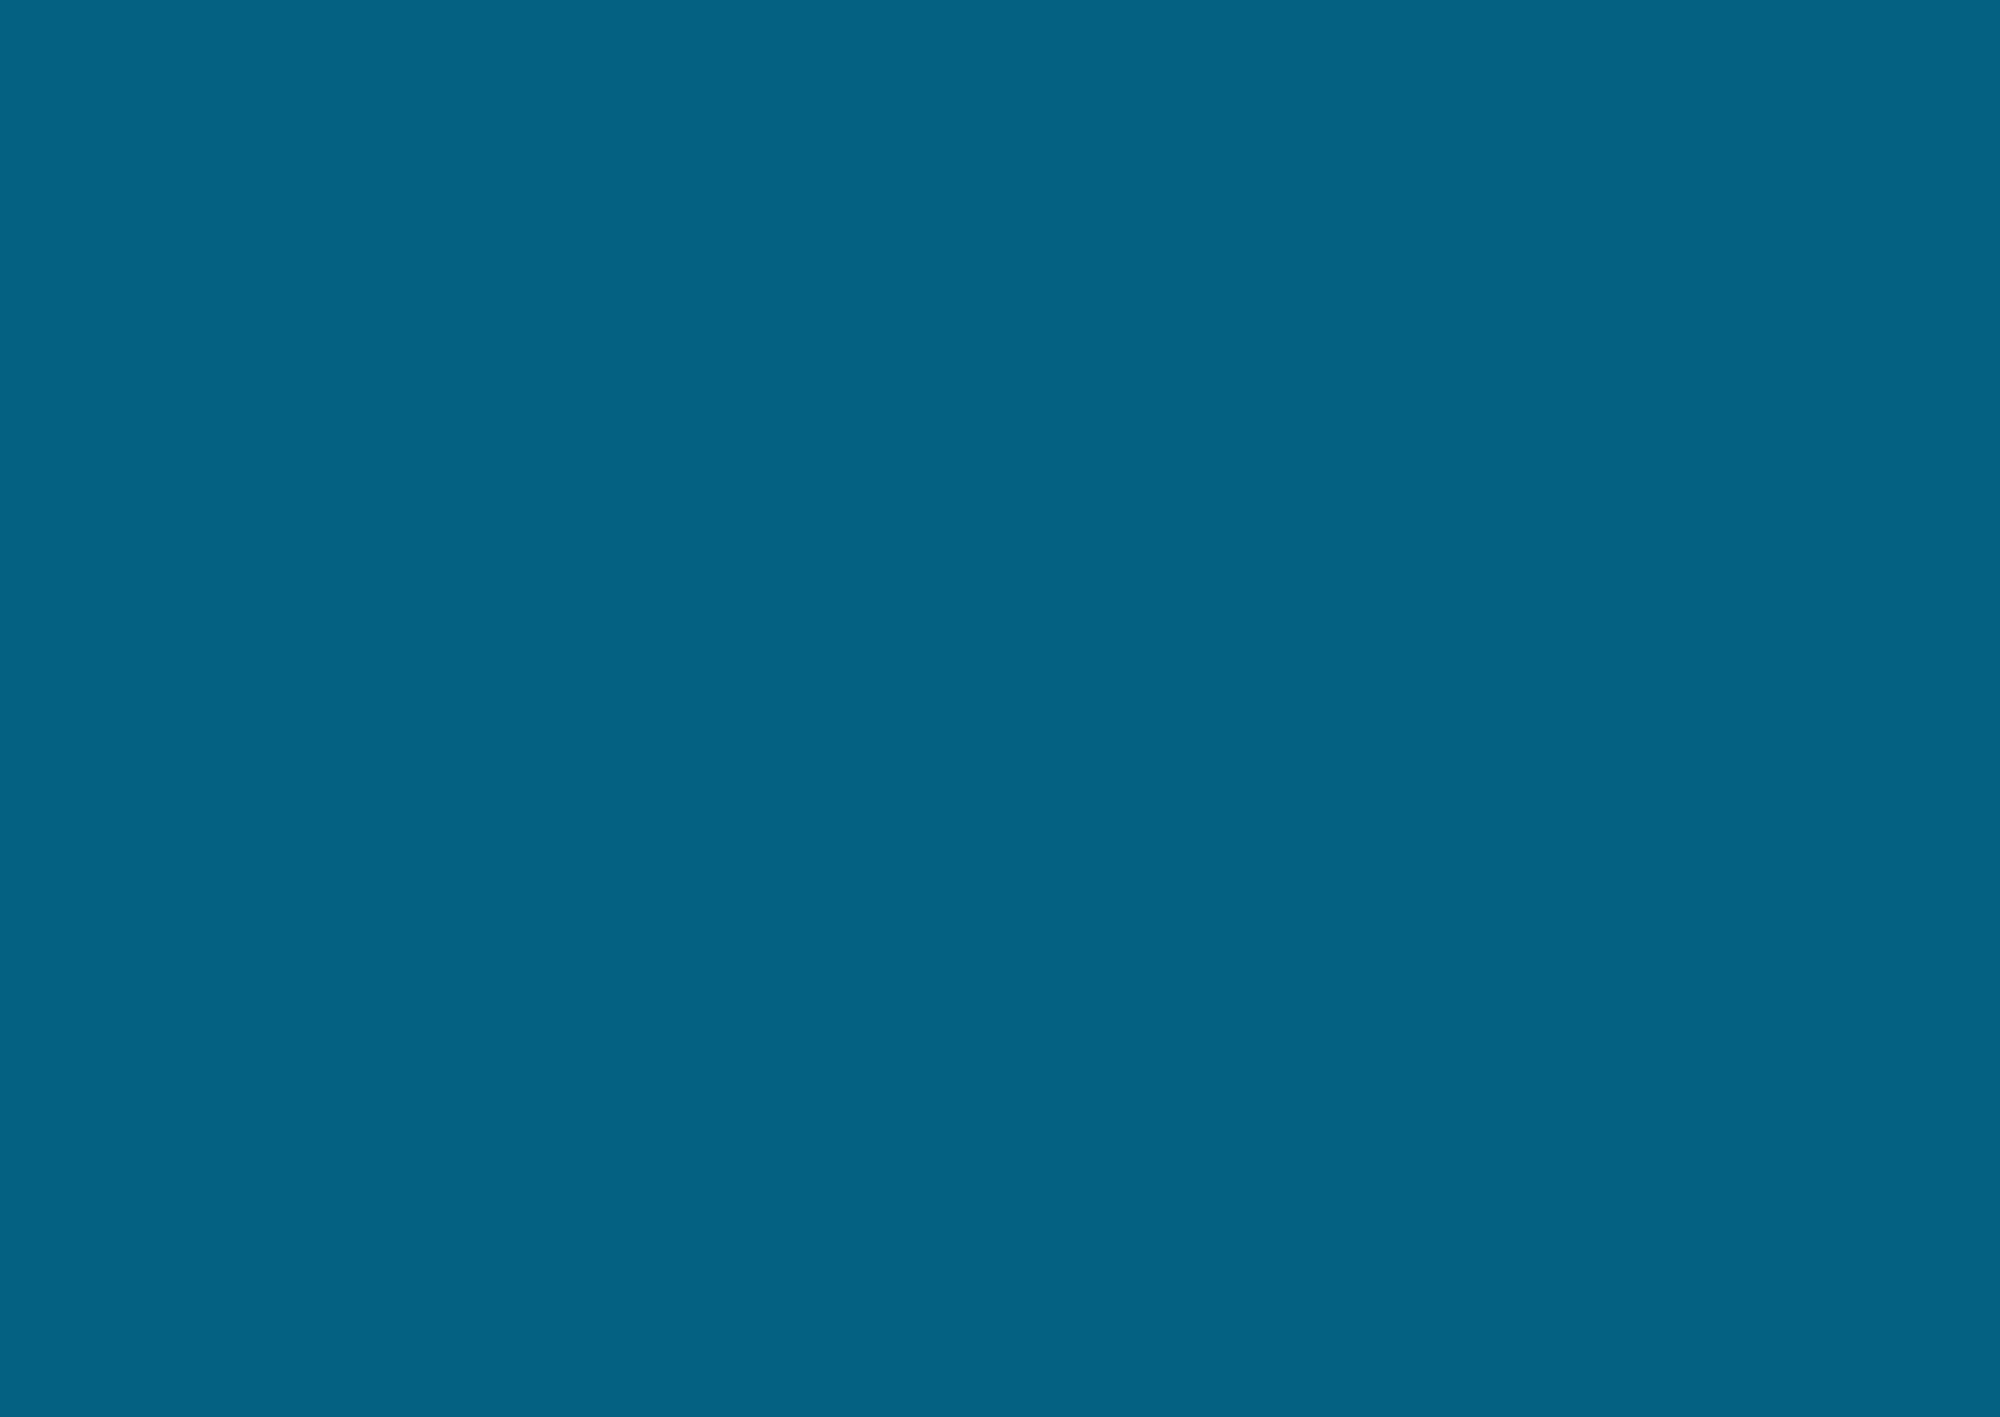 Colour Block 4.jpg